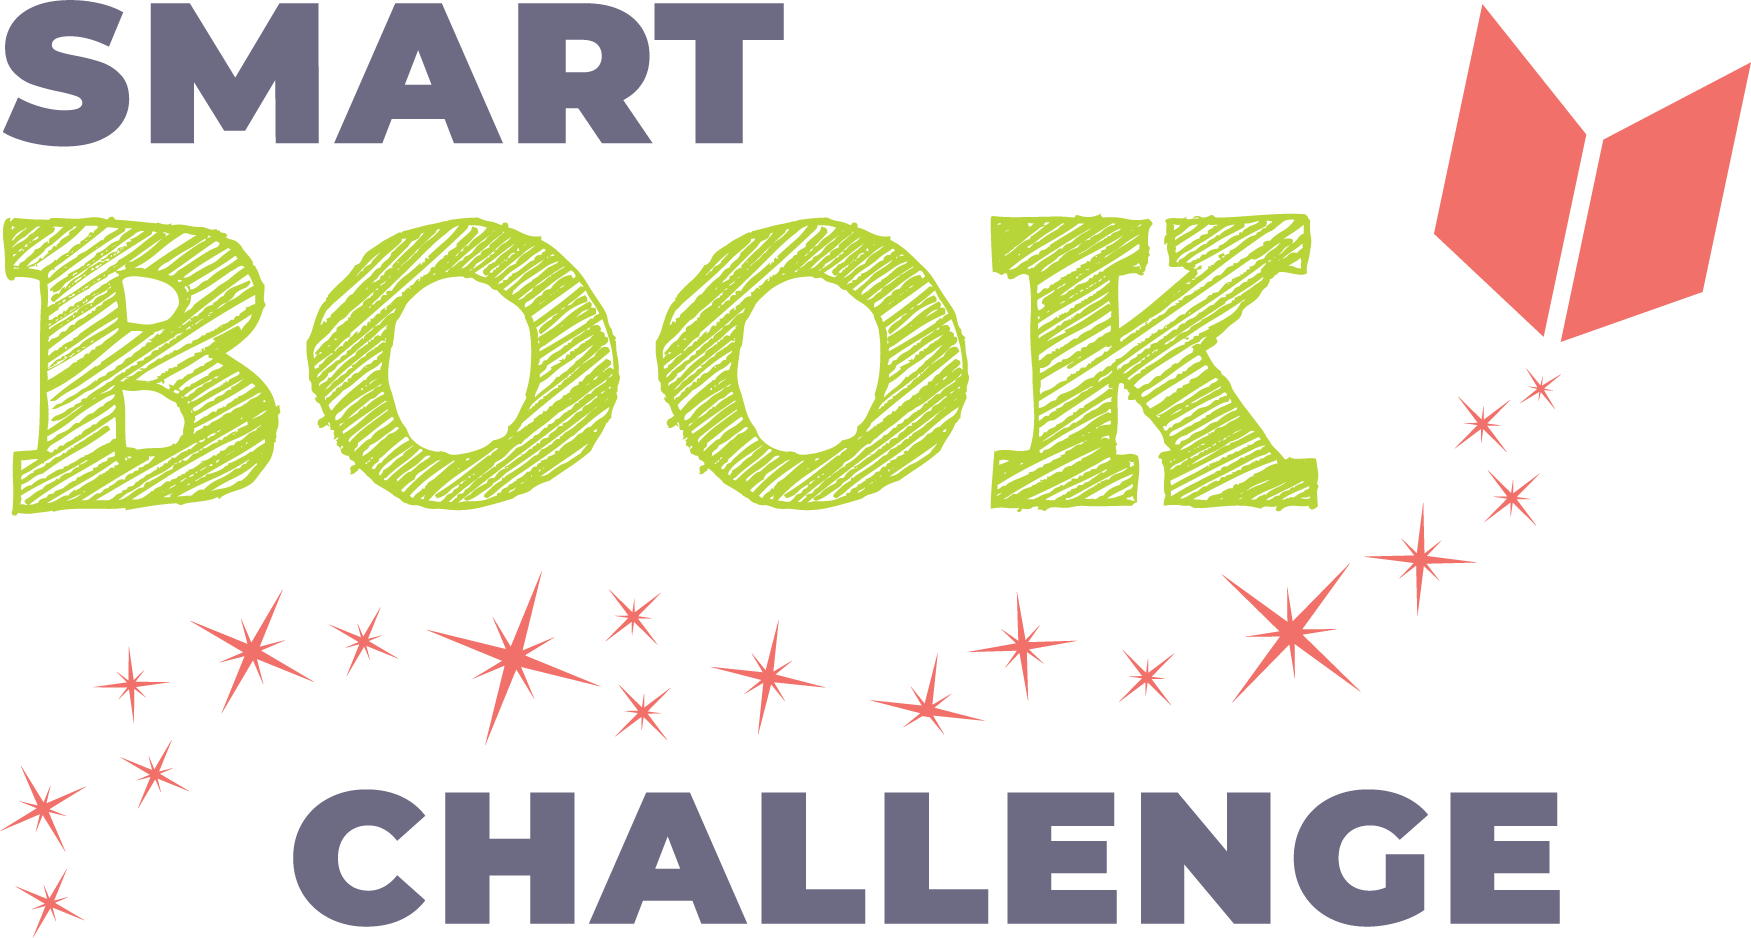 SMART Book Challenge icon